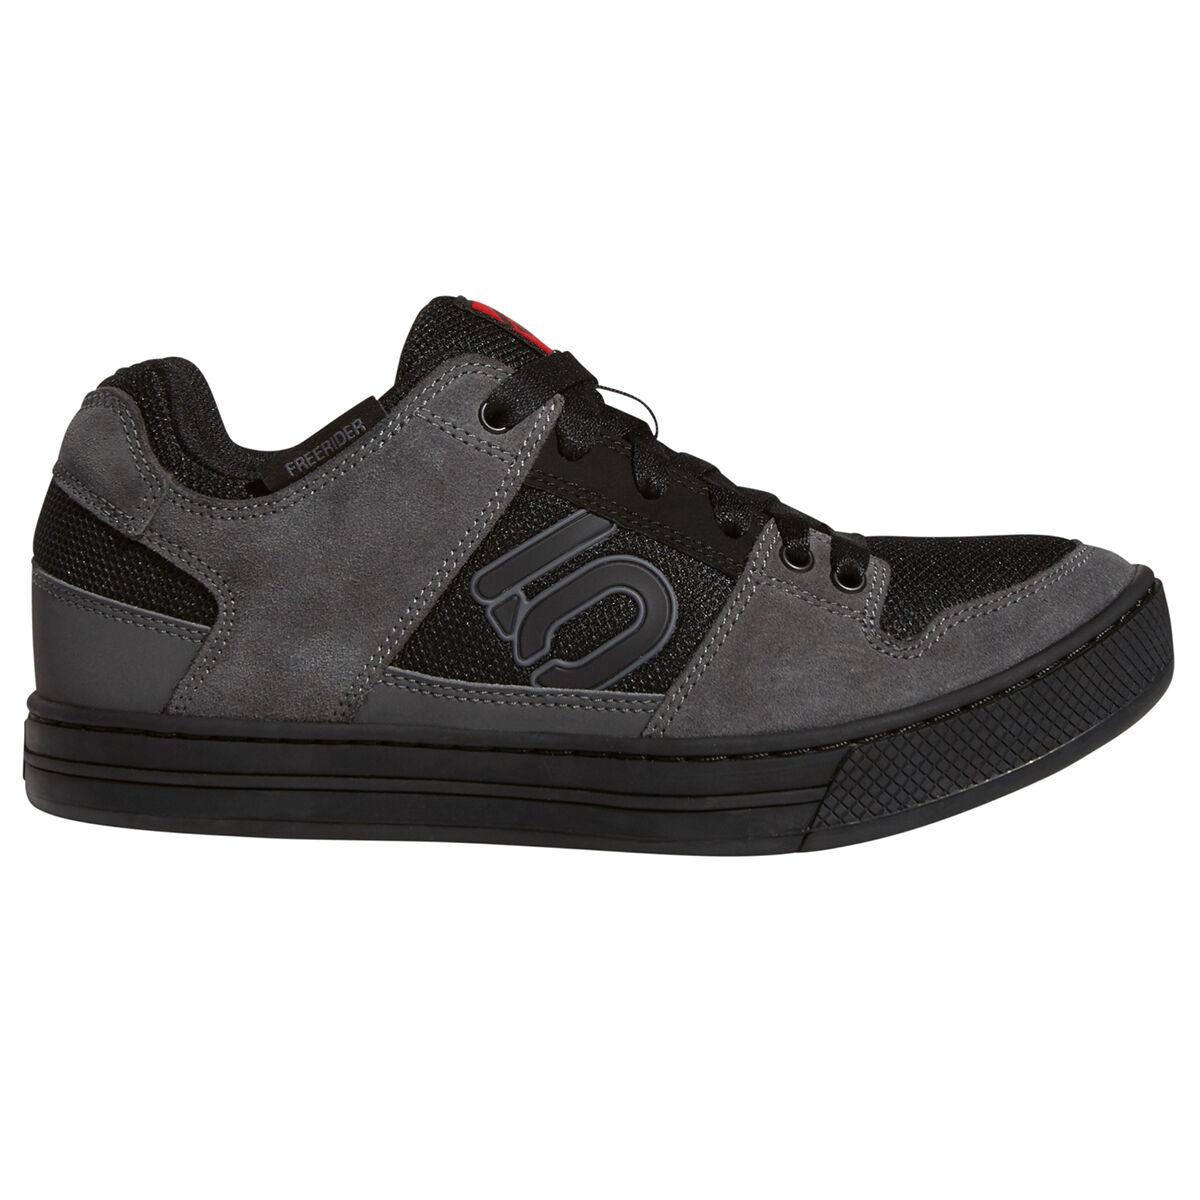 FIVE.TEN Five. ten Men's Freerider Mountain Bike Shoes - Size 9.5